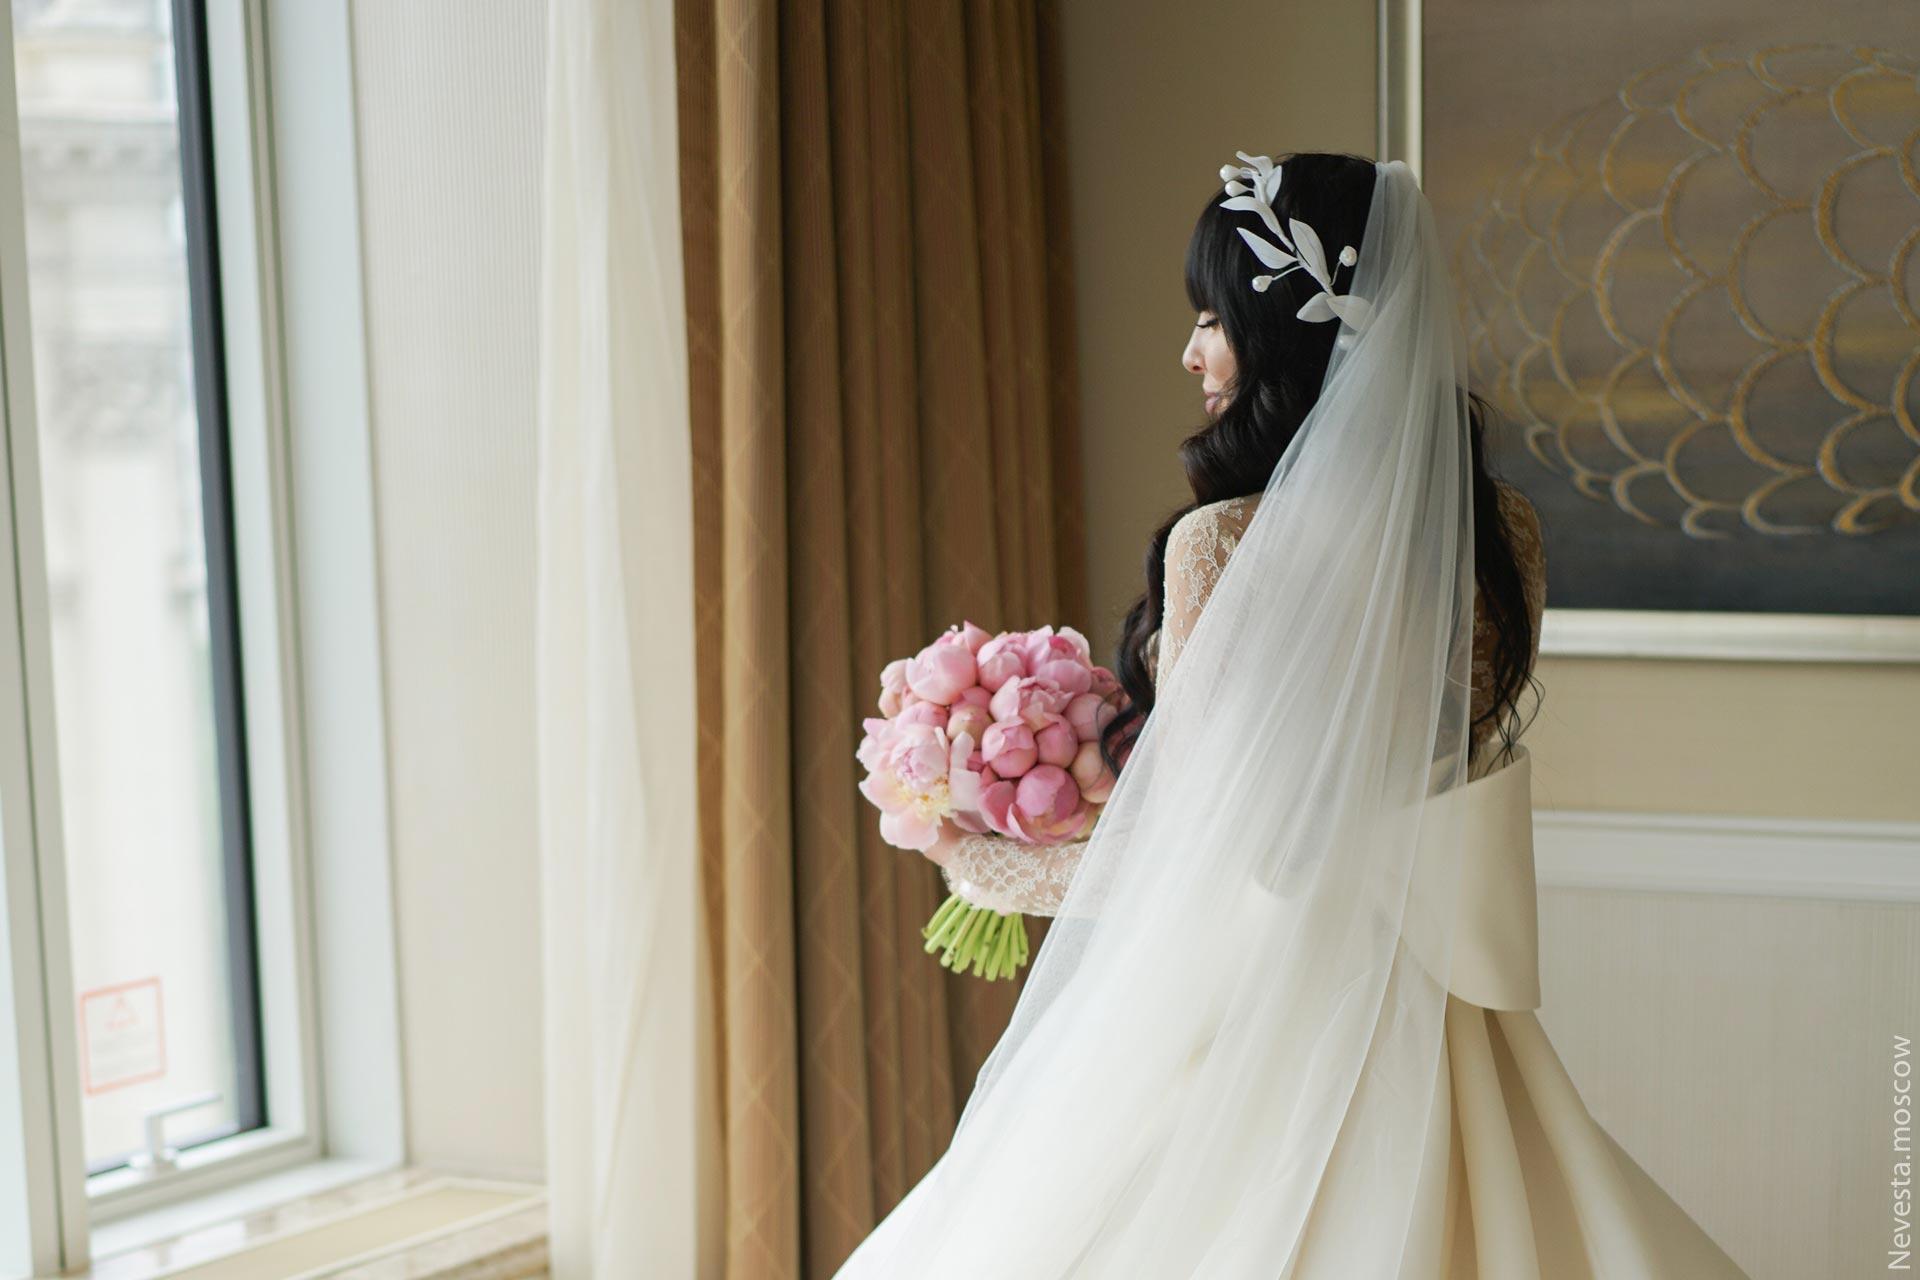 Свадьба Нелли Ермолаевой и Кирилла Андреева фото 20